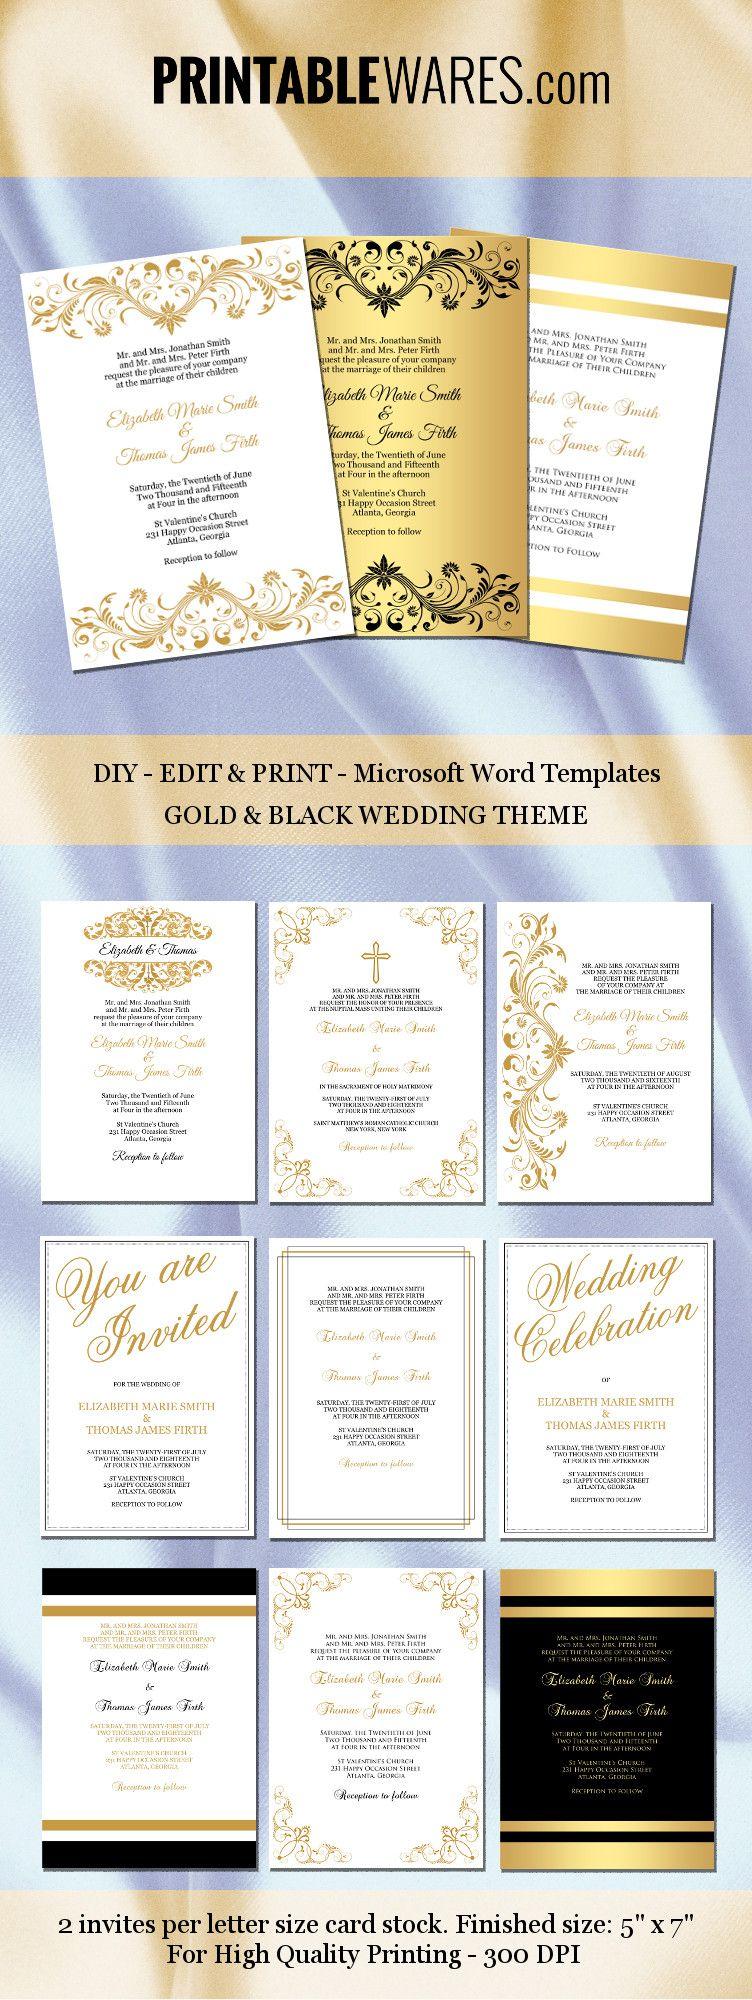 Gold and black wedding invitation templates for Microsoft Word Printable & editable Boda